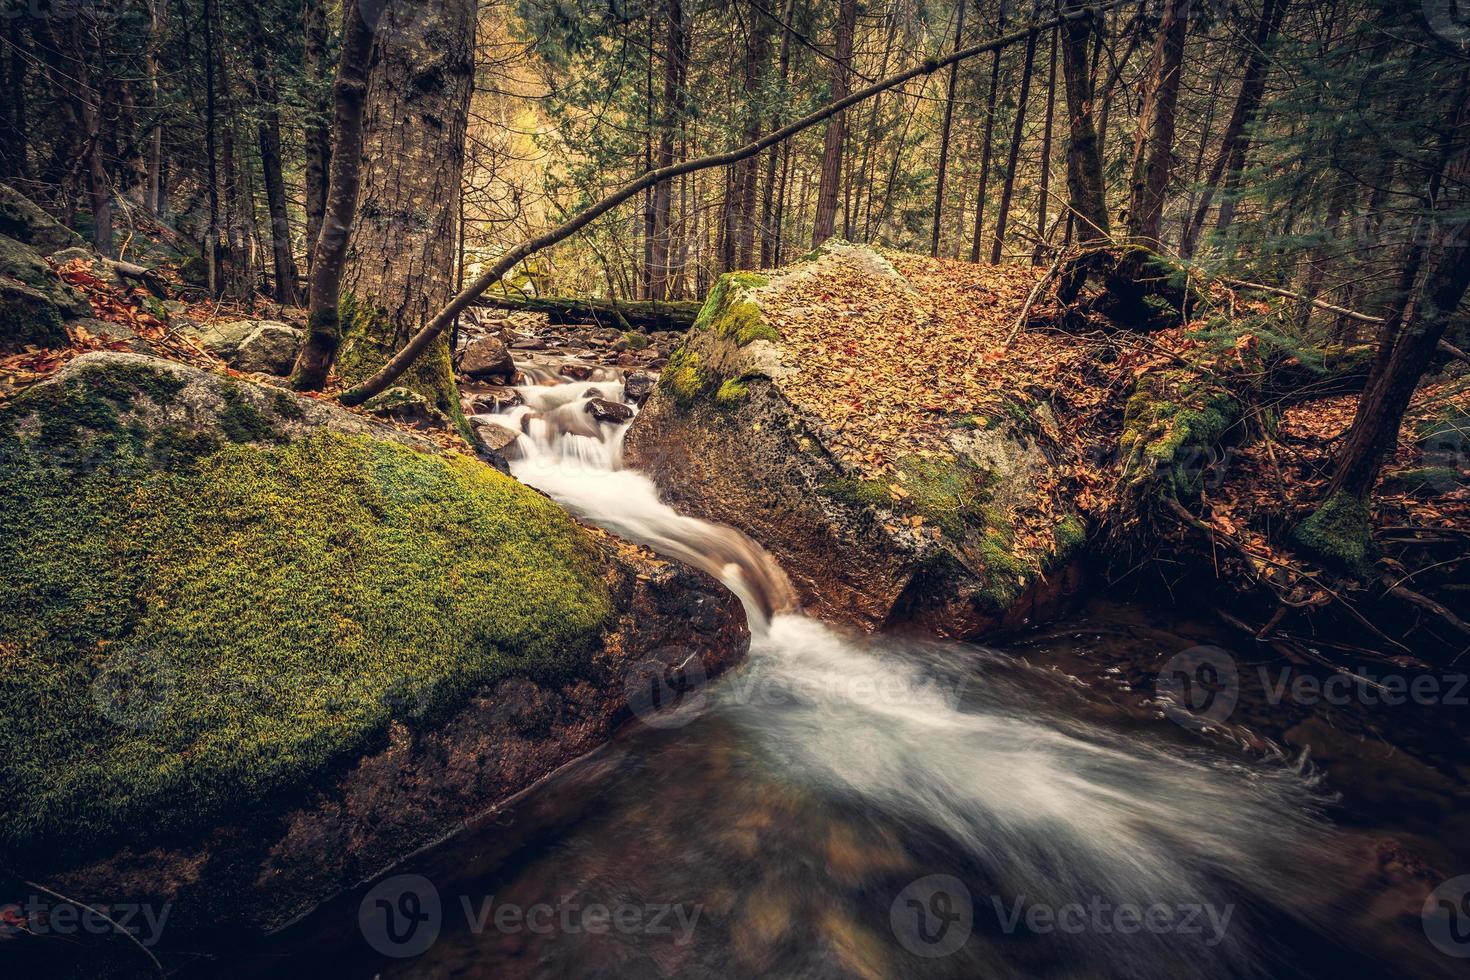 Stream, Rocks, and Moss photo